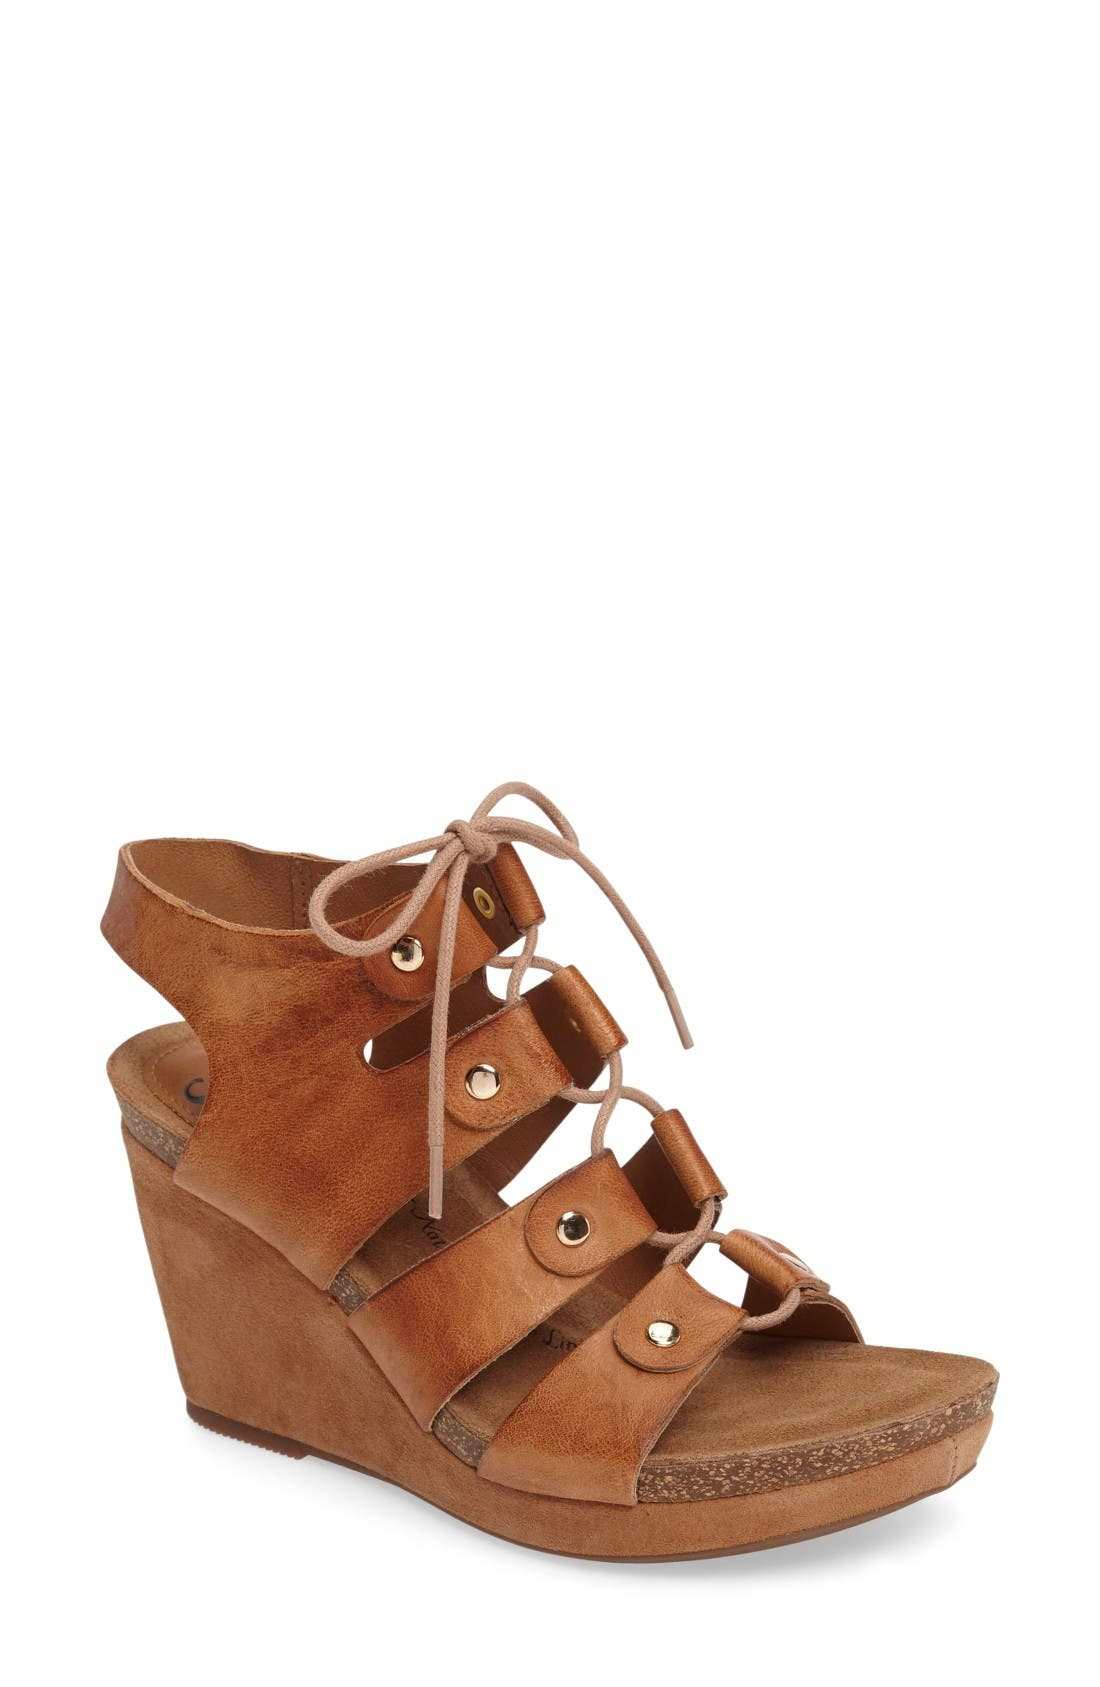 Söfft Carita Lace-Up Wedge Sandal (Women)